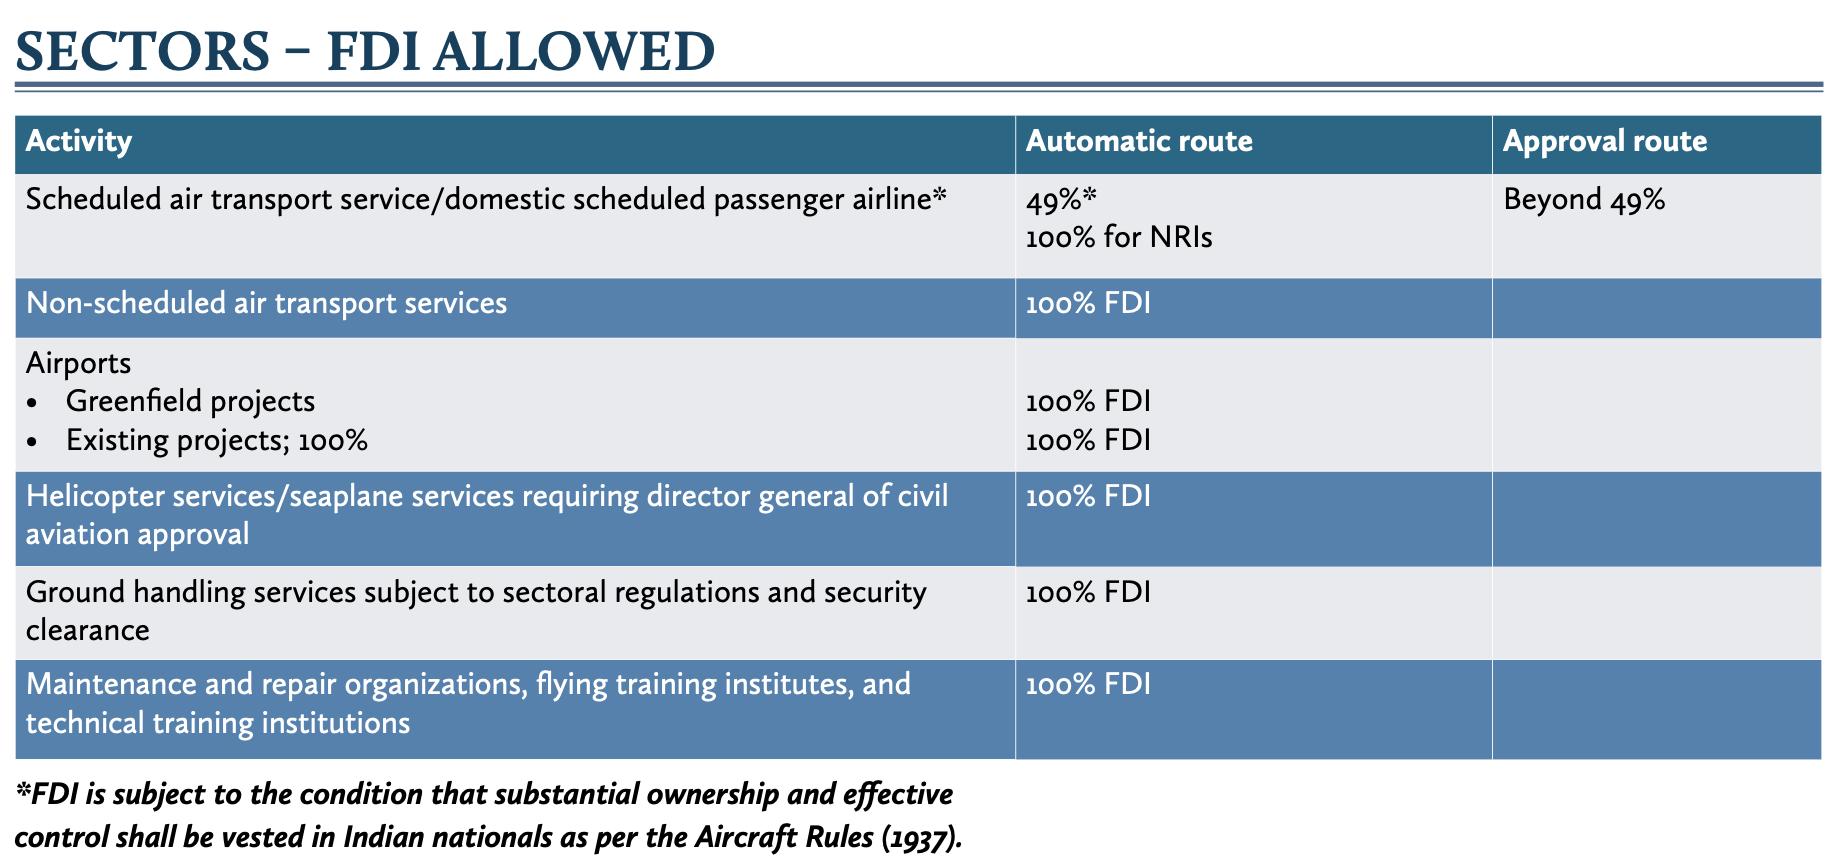 Sector - FDI allowed